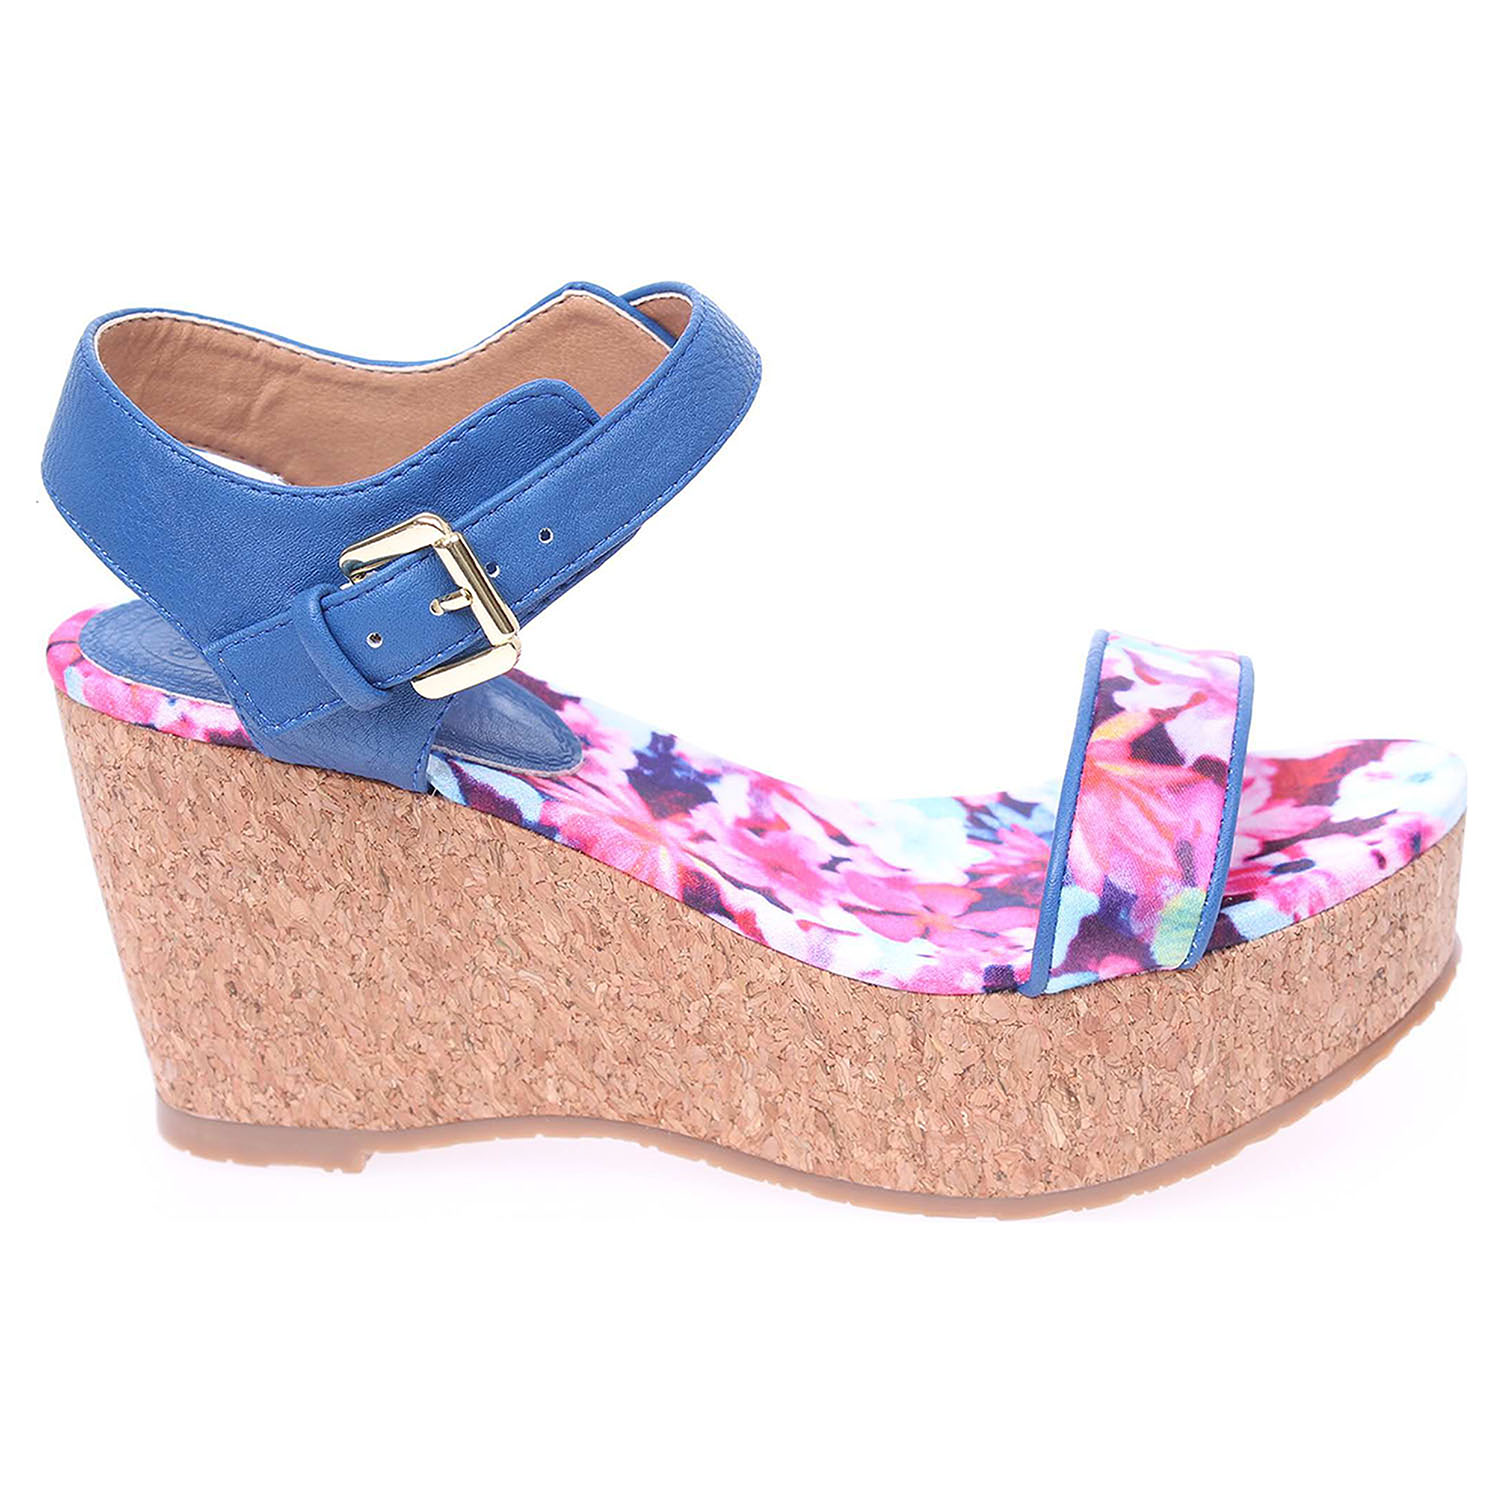 Gioseppo Cinnamon dámské sandály modré 41